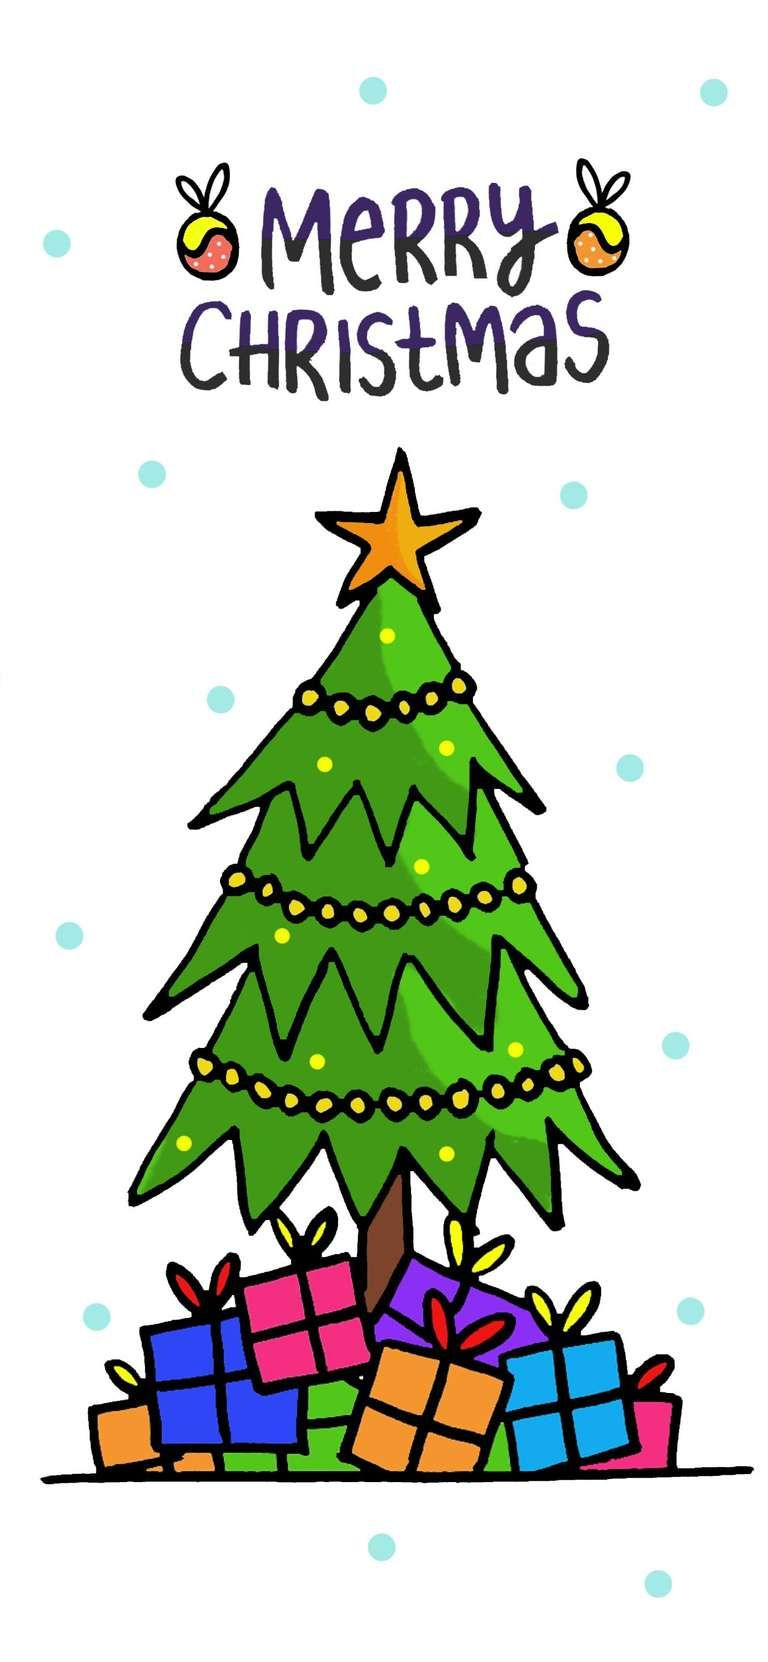 Wallpaper Iphone Cute Wallpaper Iphone Christmas Christmas Tree Wallpaper Christmas Cartoons